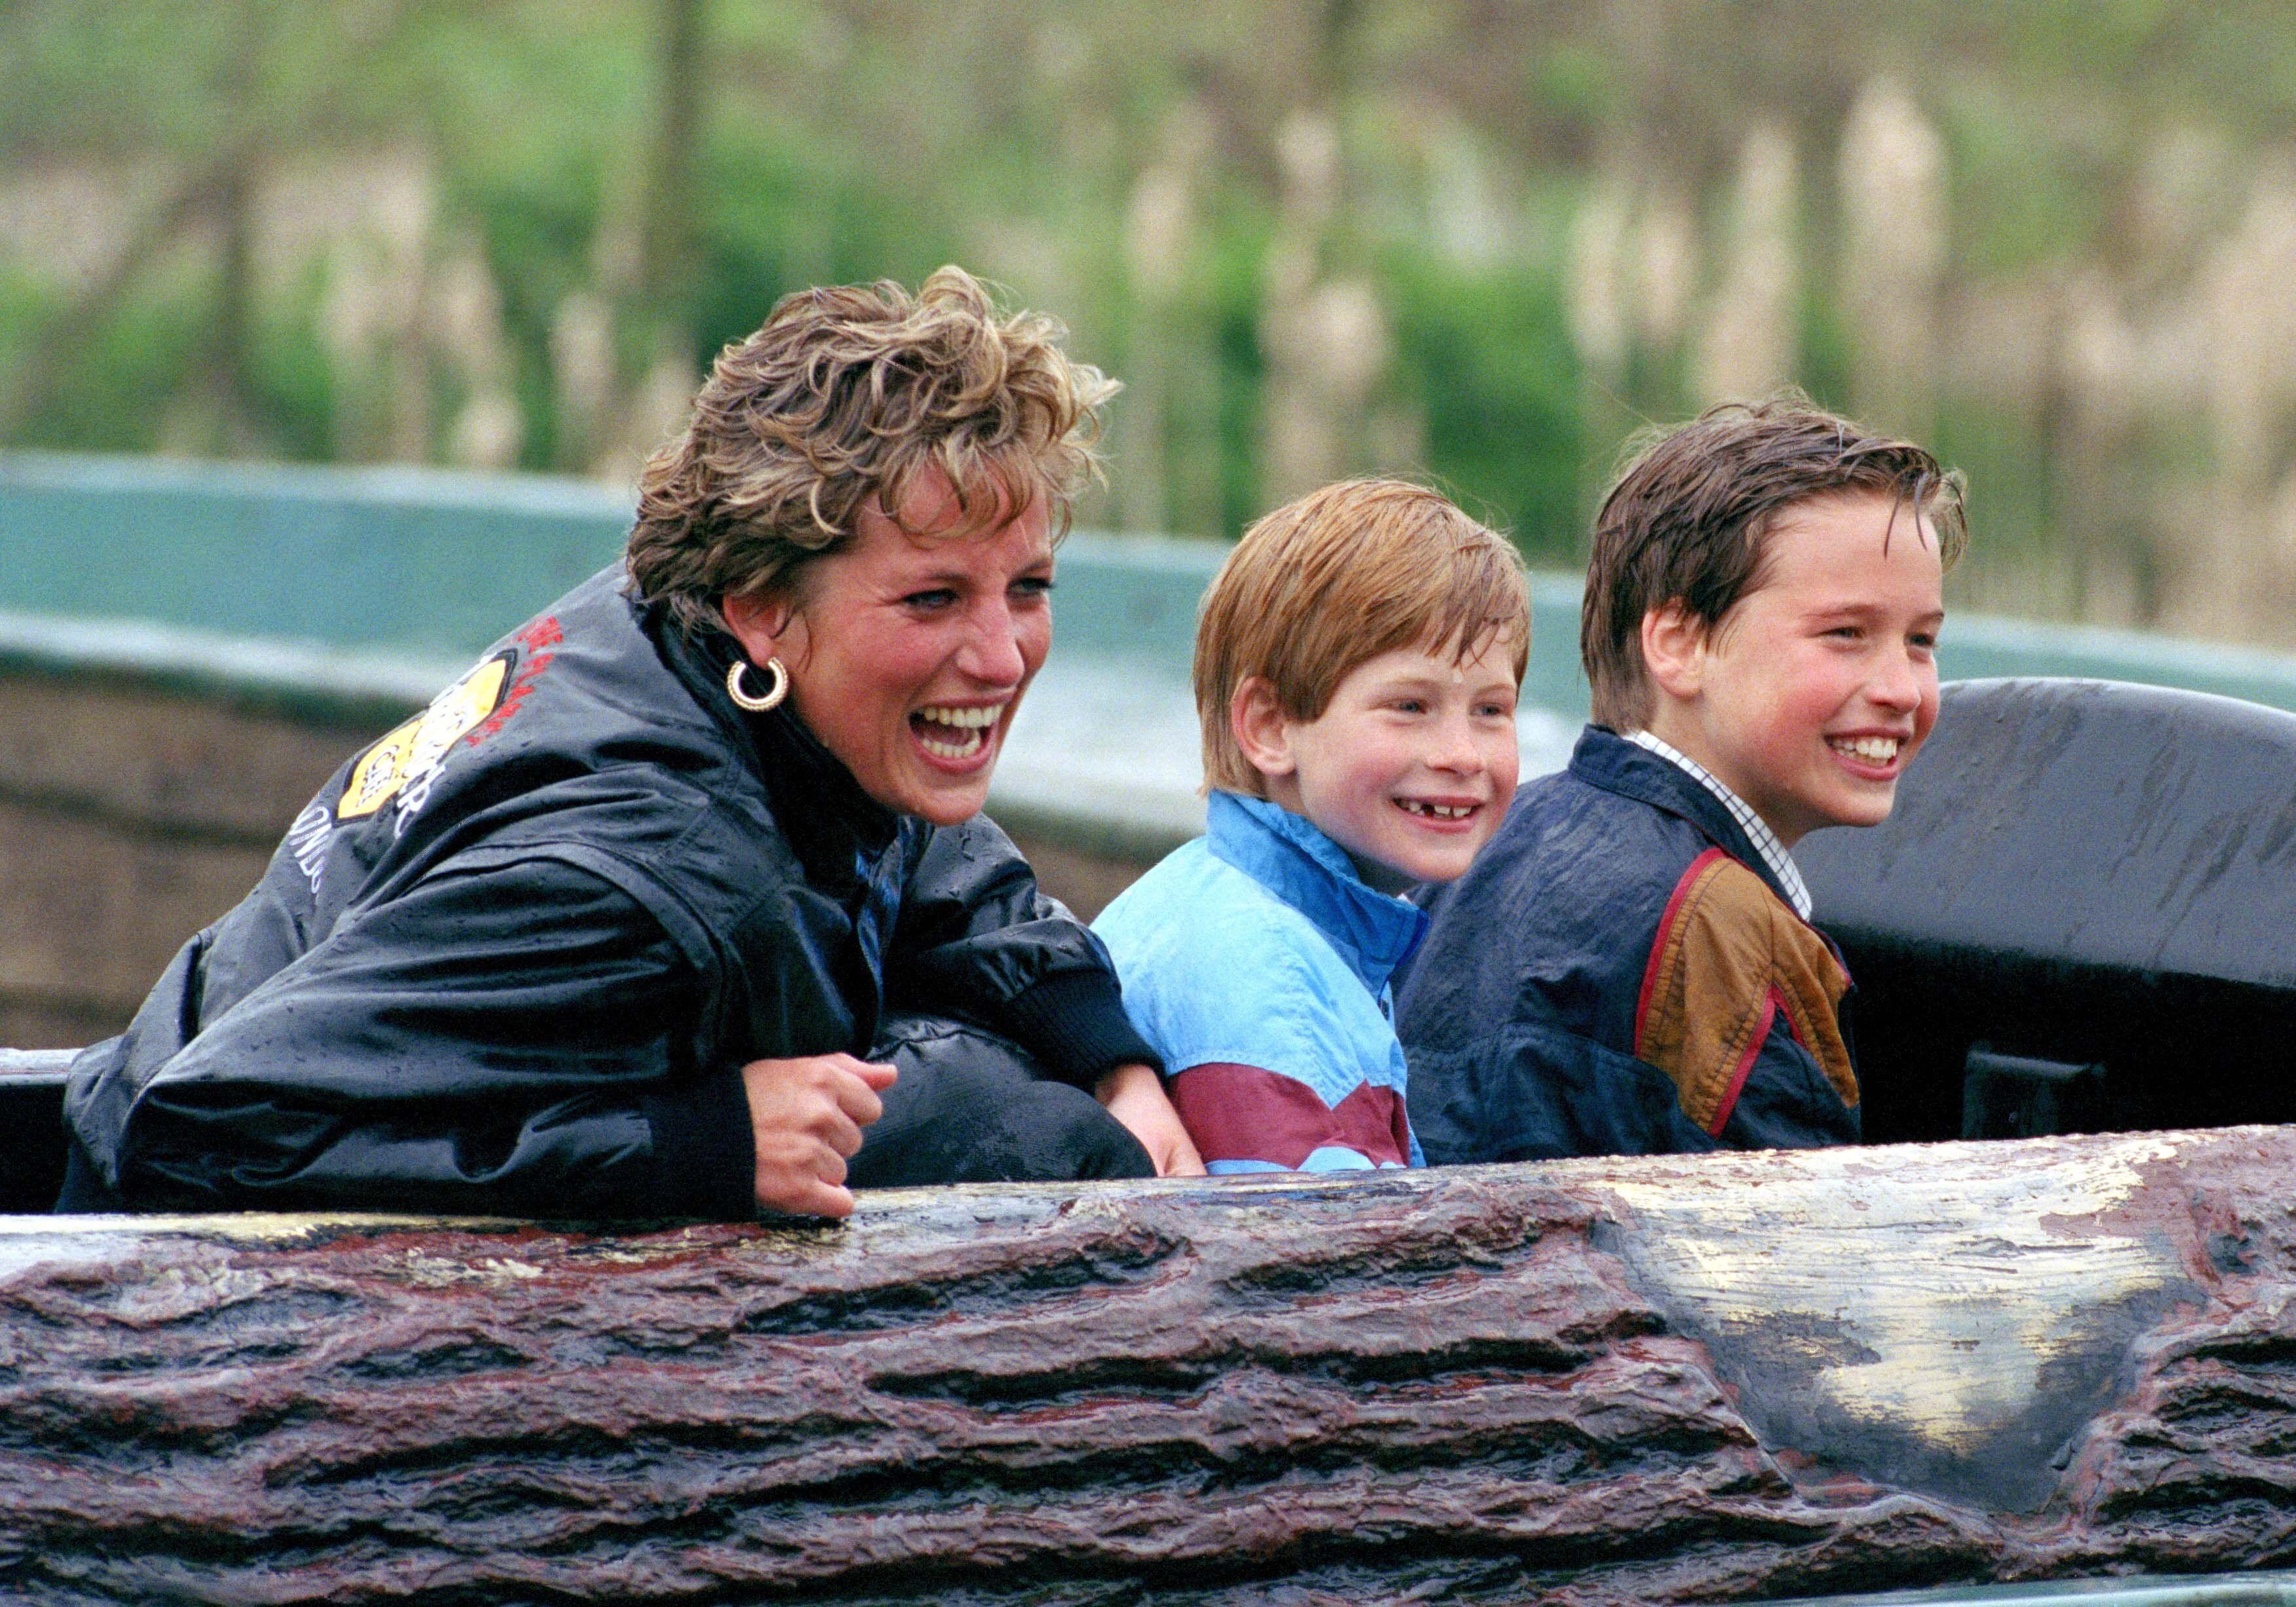 Princess Diana, Prince Harry (center) and Prince William (right) at Thorpe Park.